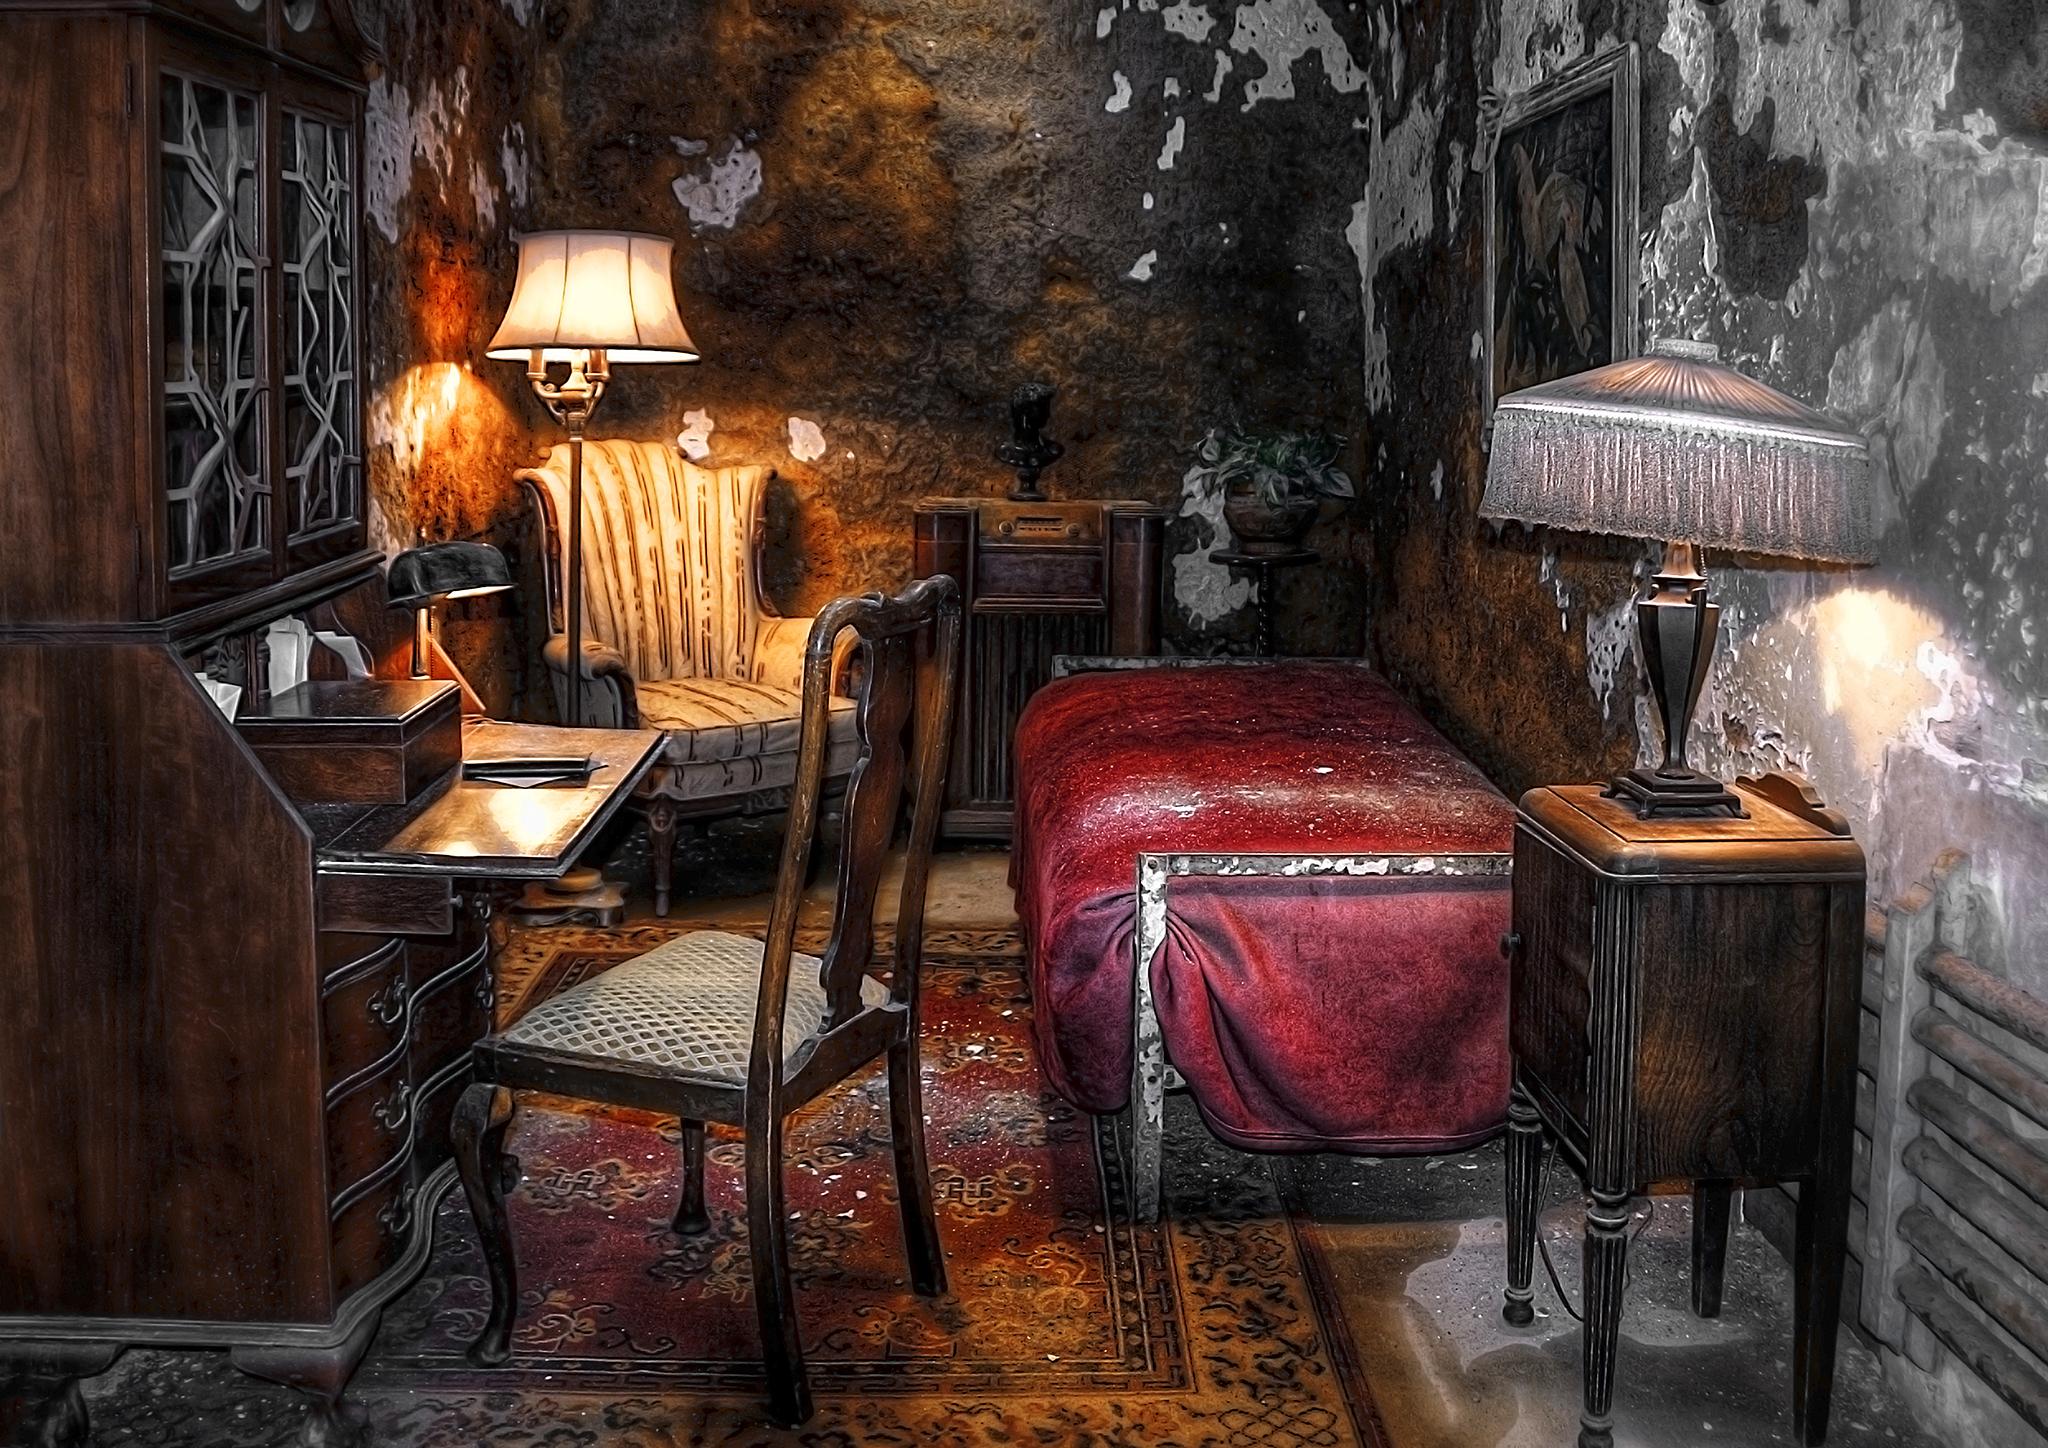 Al Capone cell in Philadelphia, USA